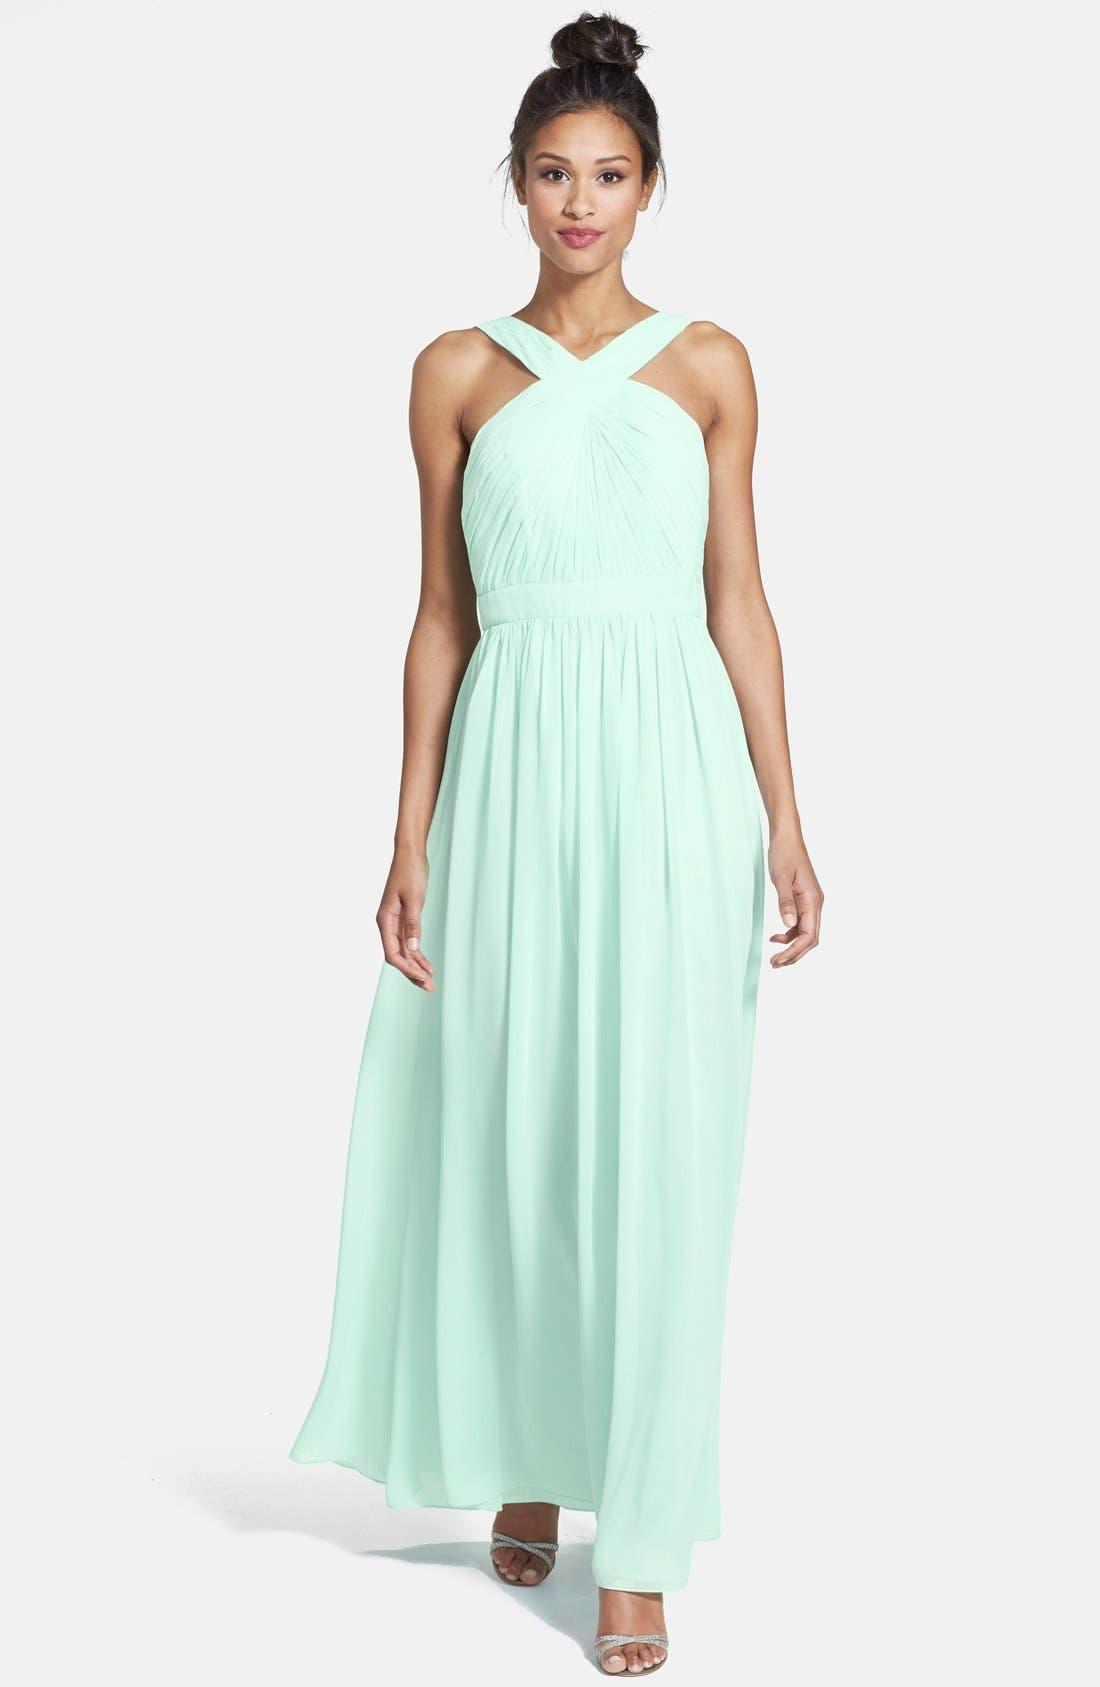 Alternate Image 1 Selected - Monique Lhuillier Bridesmaids Crisscross Chiffon Gown (Nordstrom Exclusive)